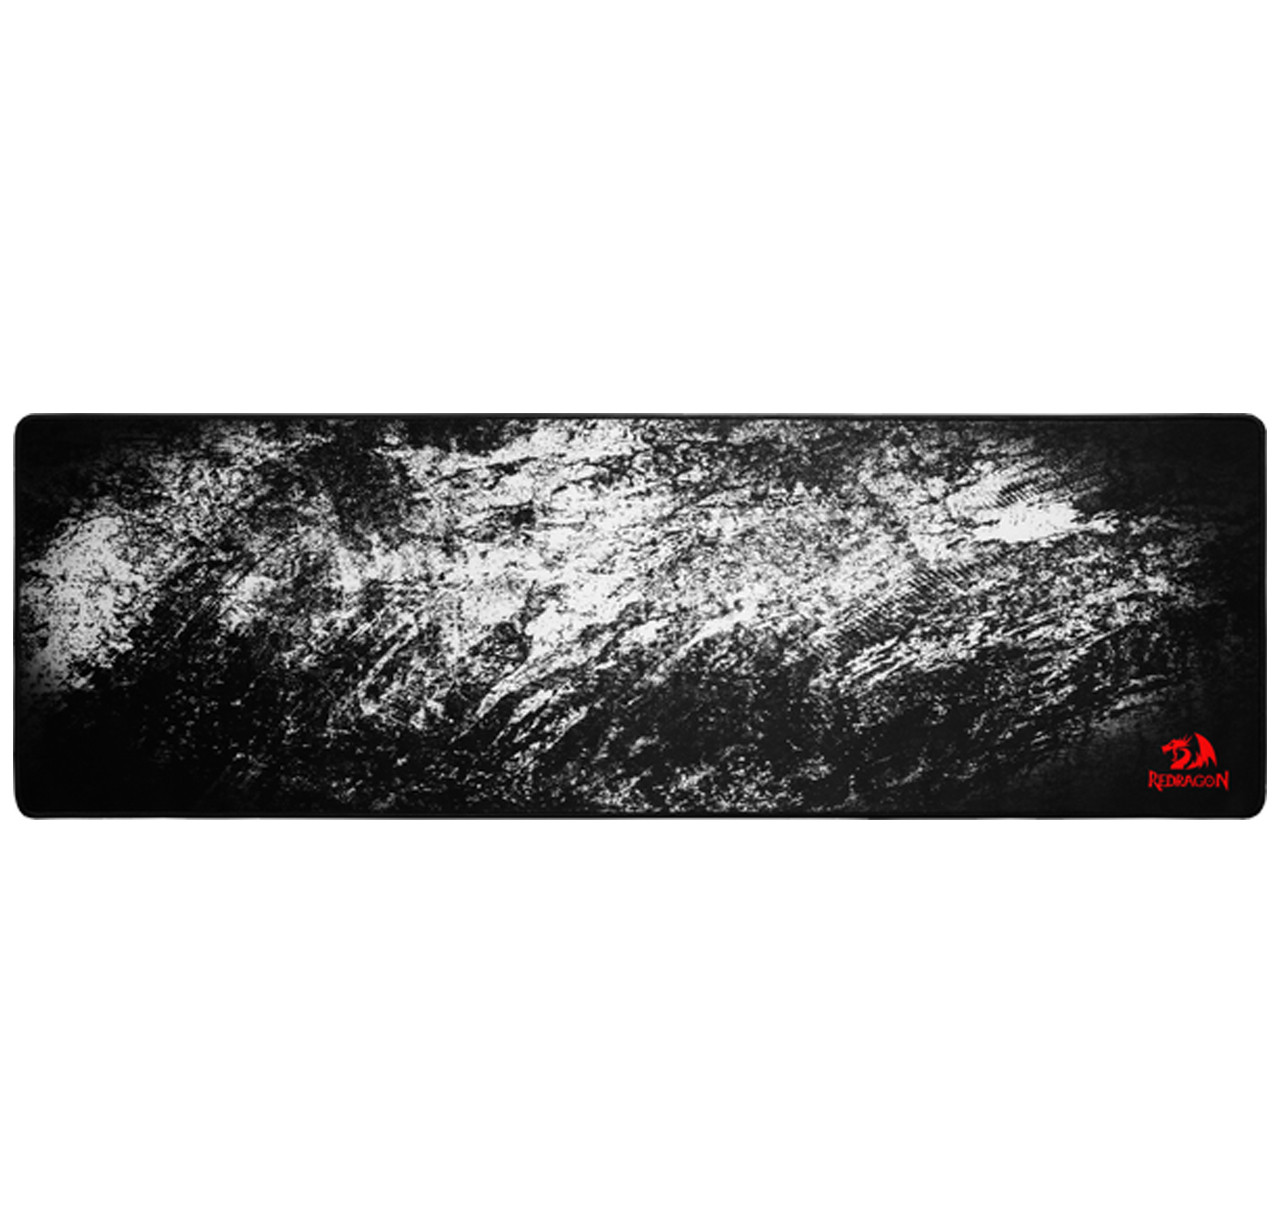 Игровой коврик для мышки REDRAGON Taurus Speed Black / White